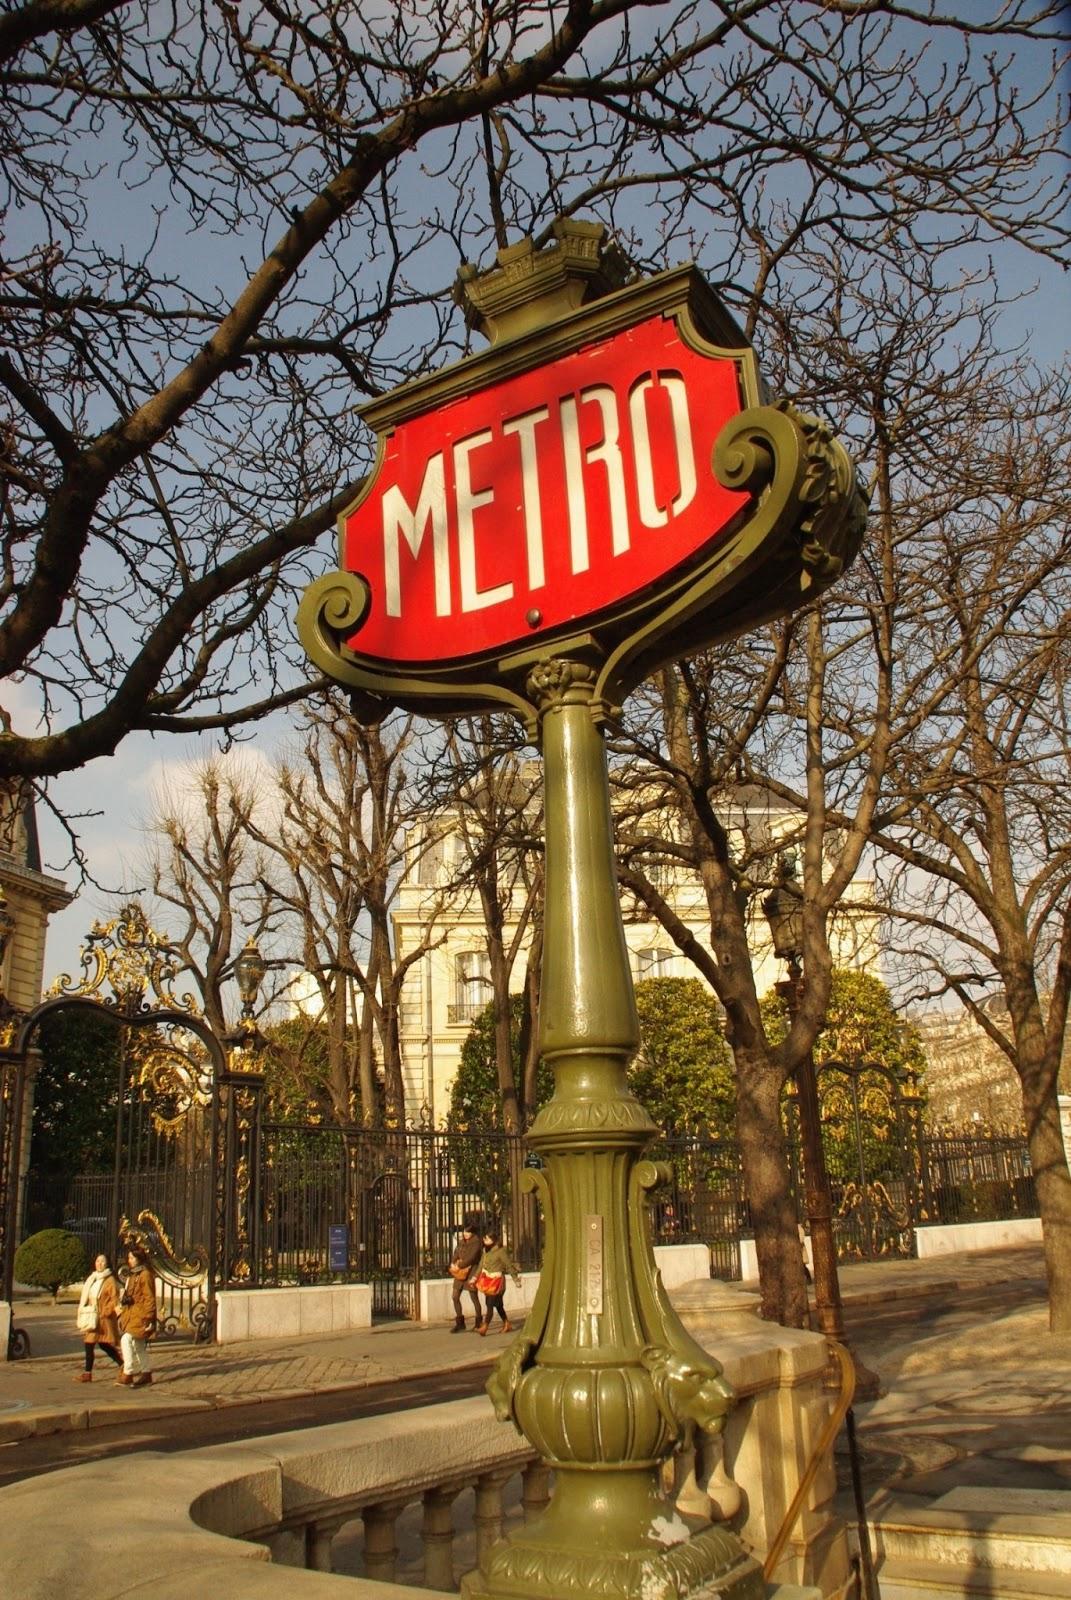 Paryż Paryz Paris metro subway znaki metra w Paryżu